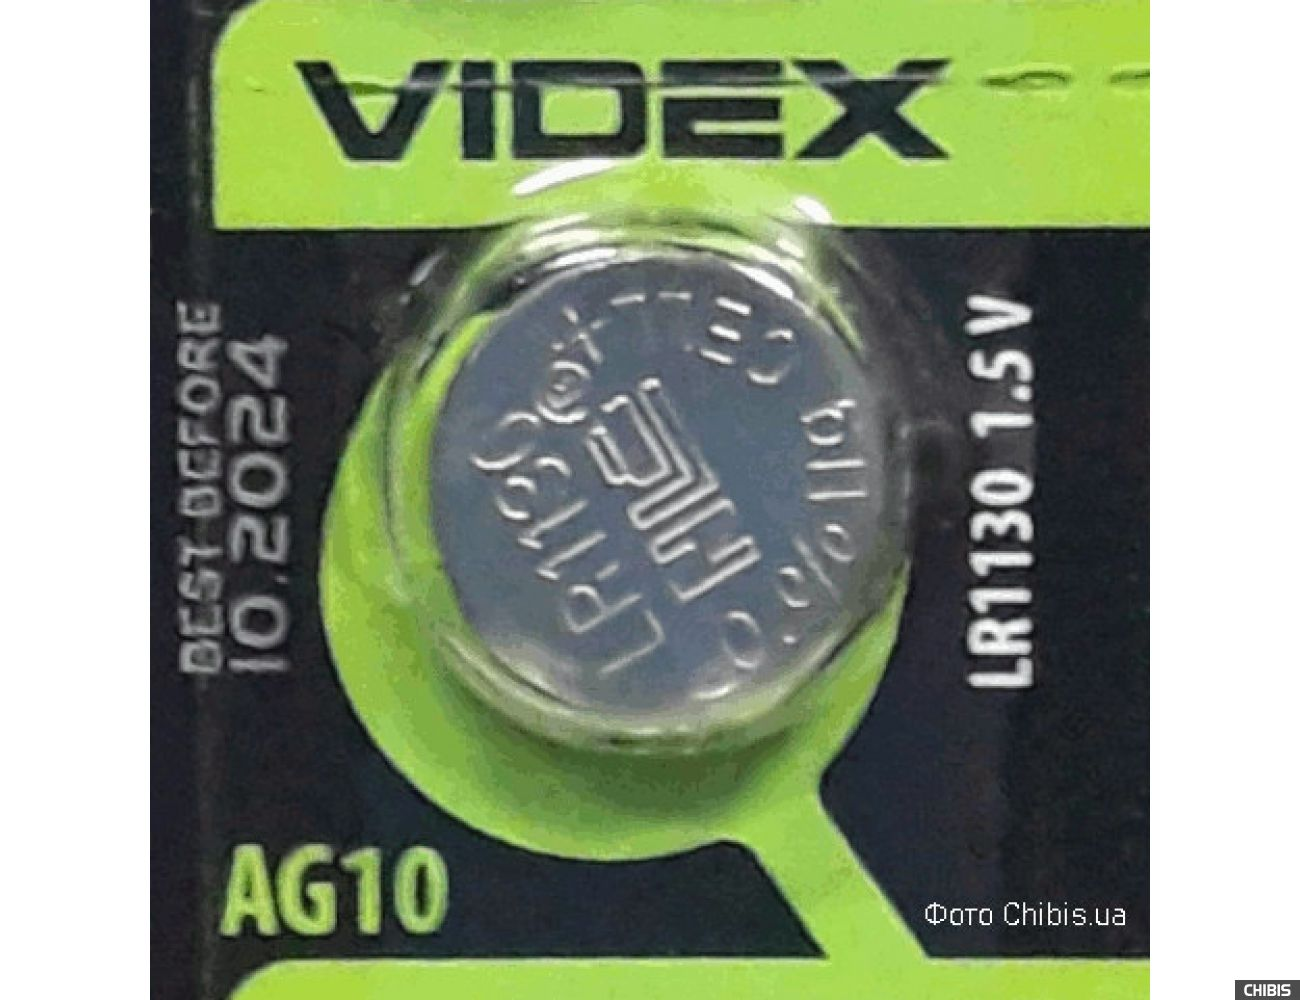 Батарейка Videx LR1130 Alkaline 1.5V